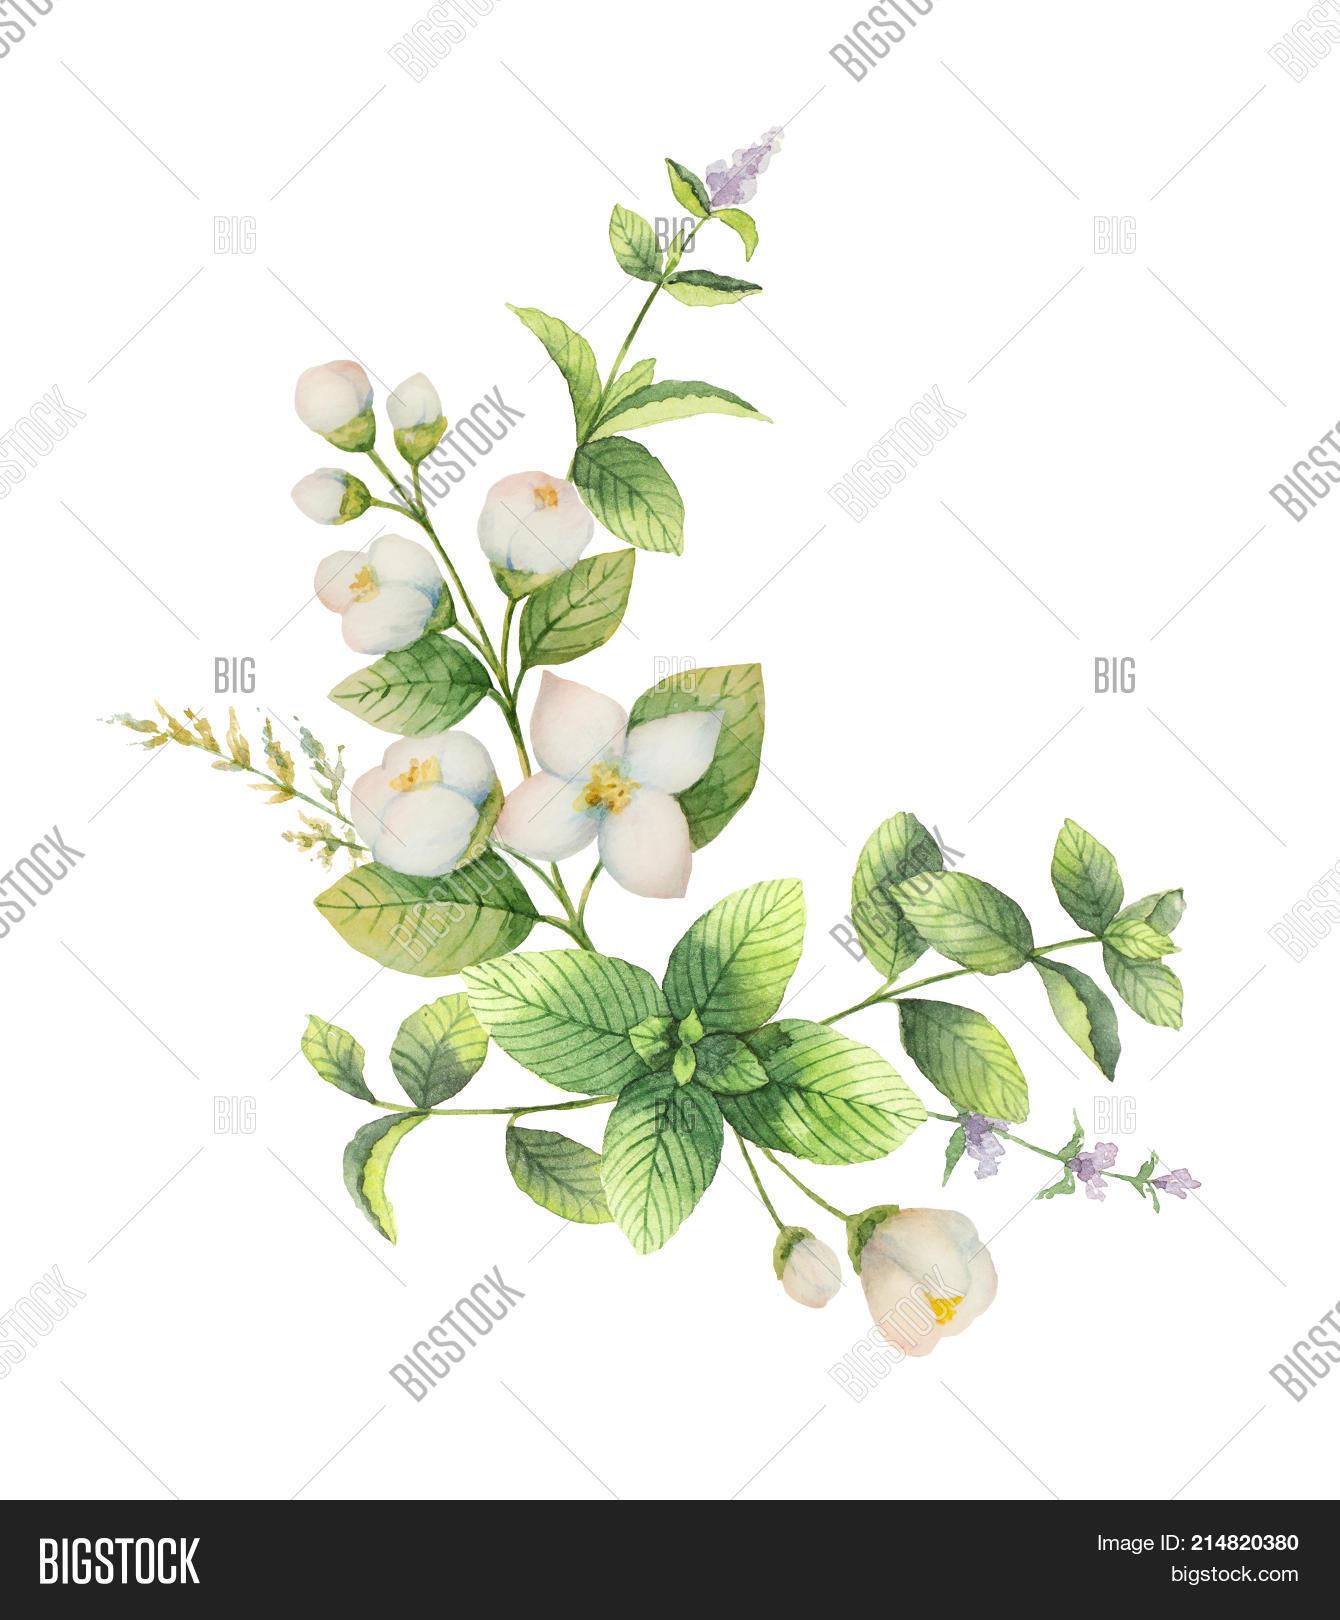 Watercolor Wreath Image Photo Free Trial Bigstock